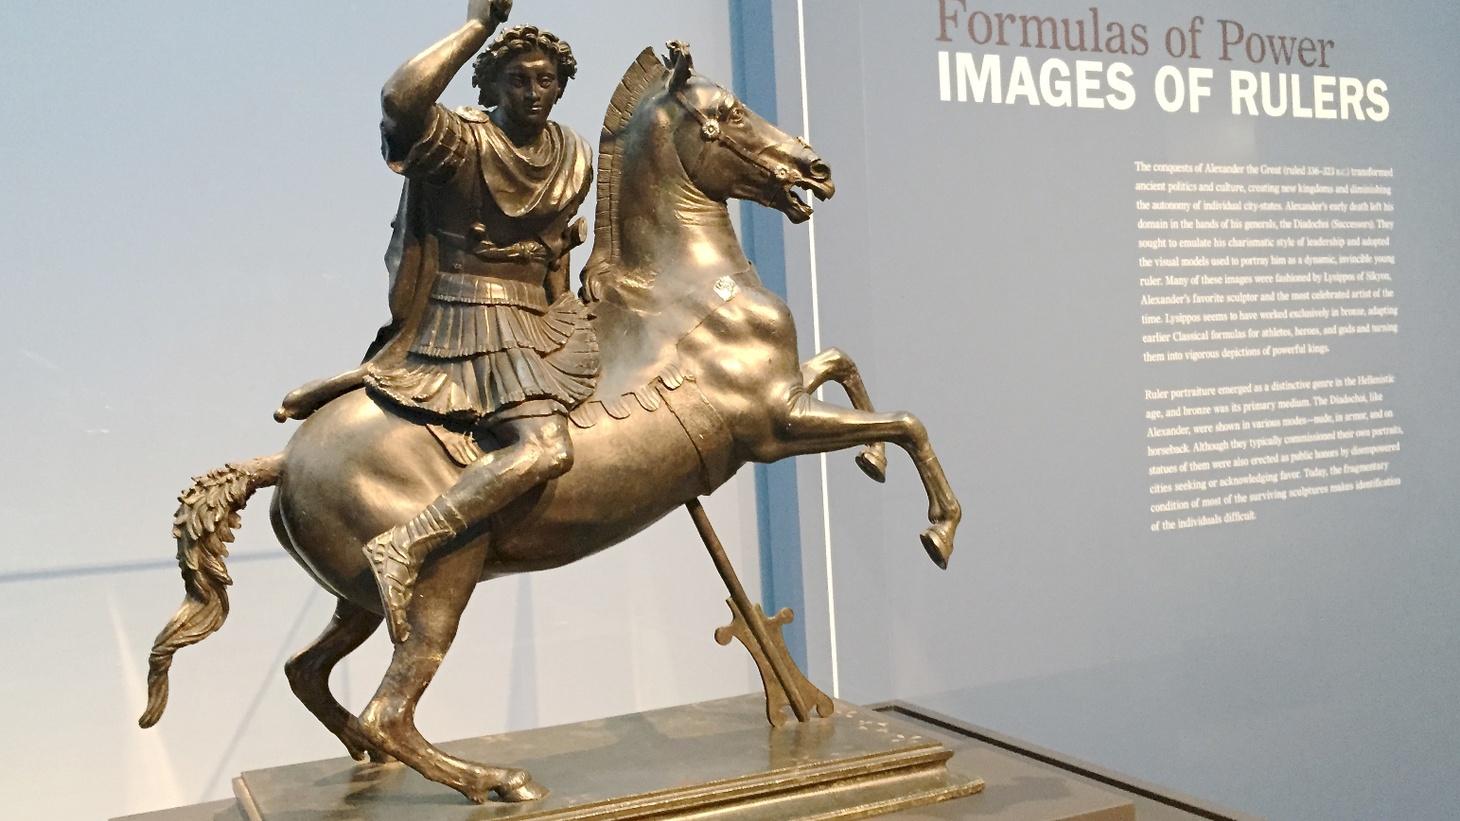 Edward Goldman talks about a unique and expansive Hellenistic bronze sculpture exhibit at the Getty Center.